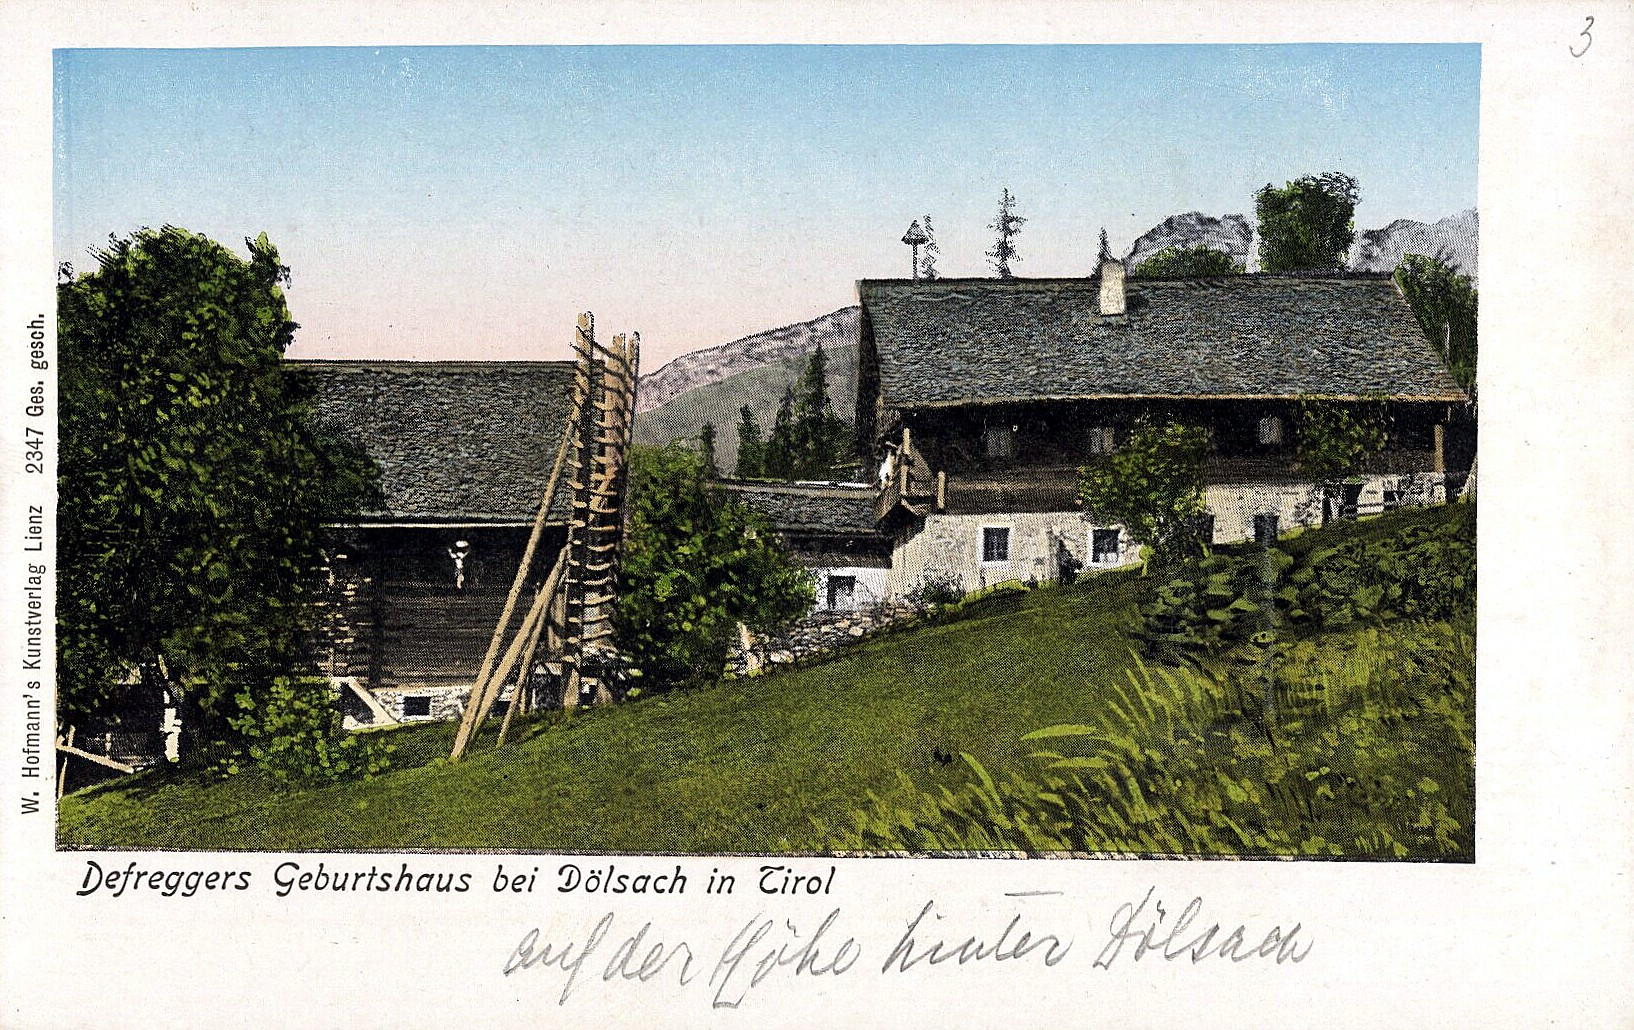 Stronach 1900, Defreggers Geburtshaus